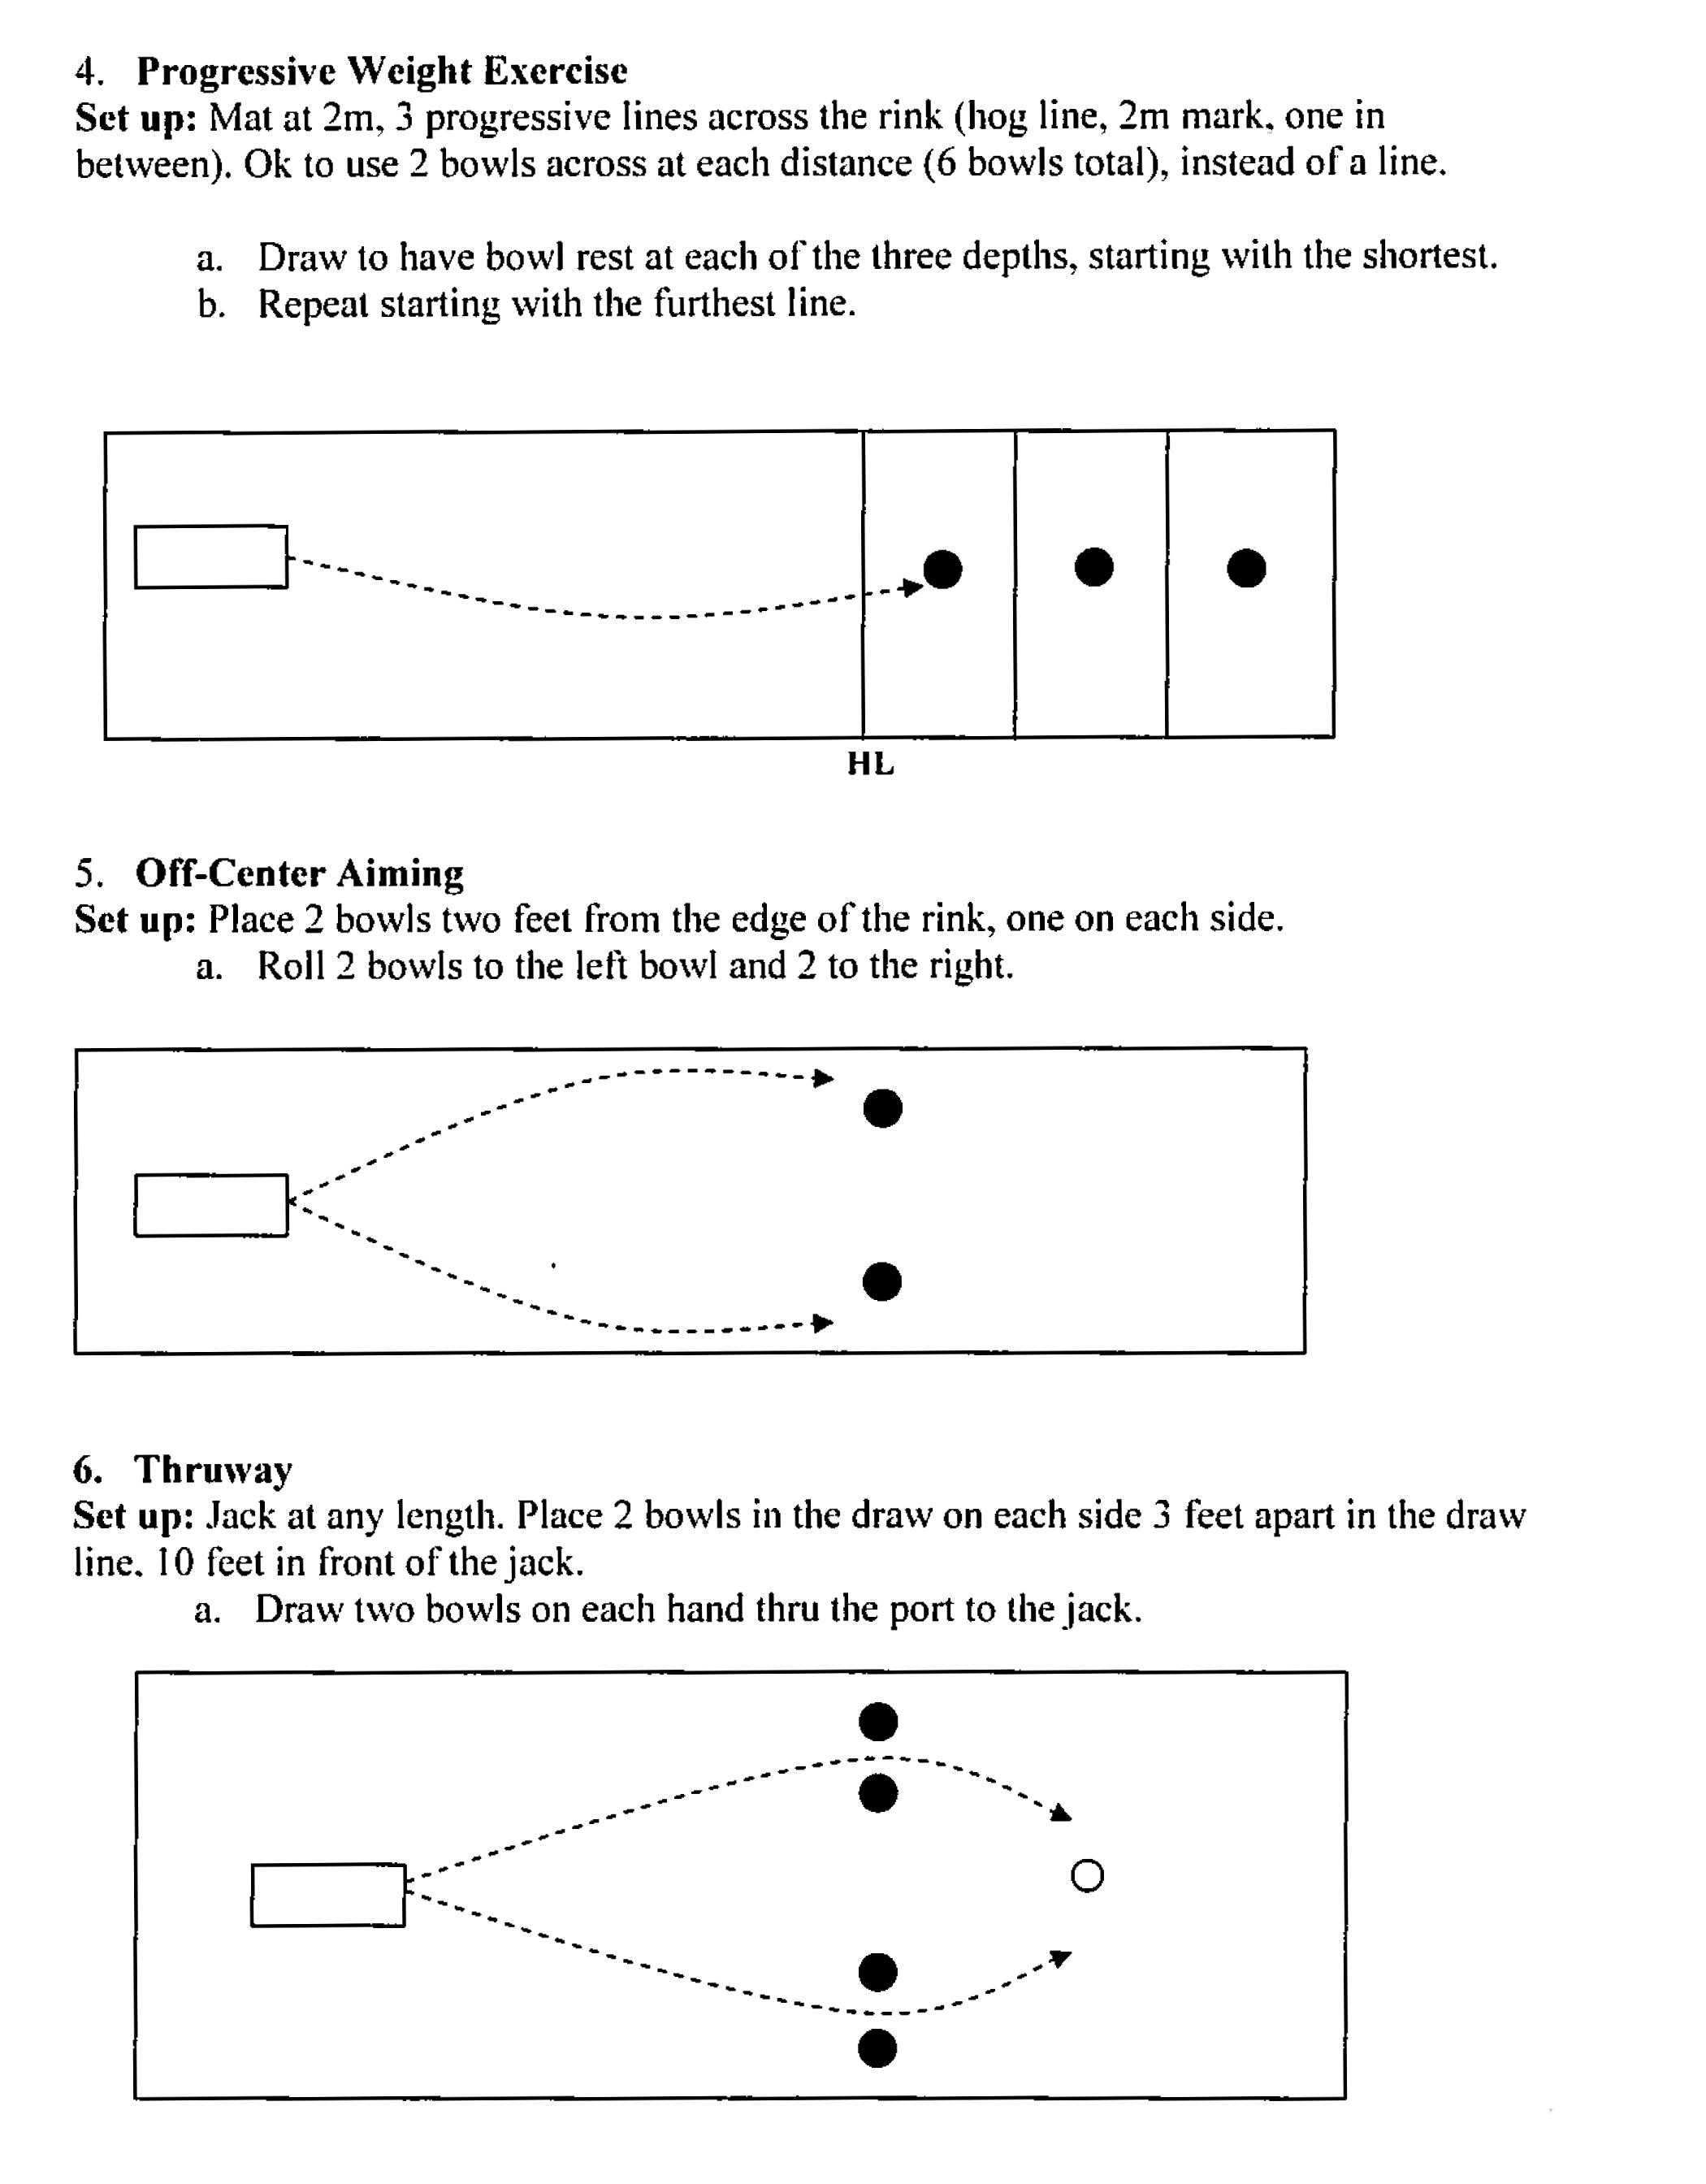 Lawn-Bowling-drills-2.png